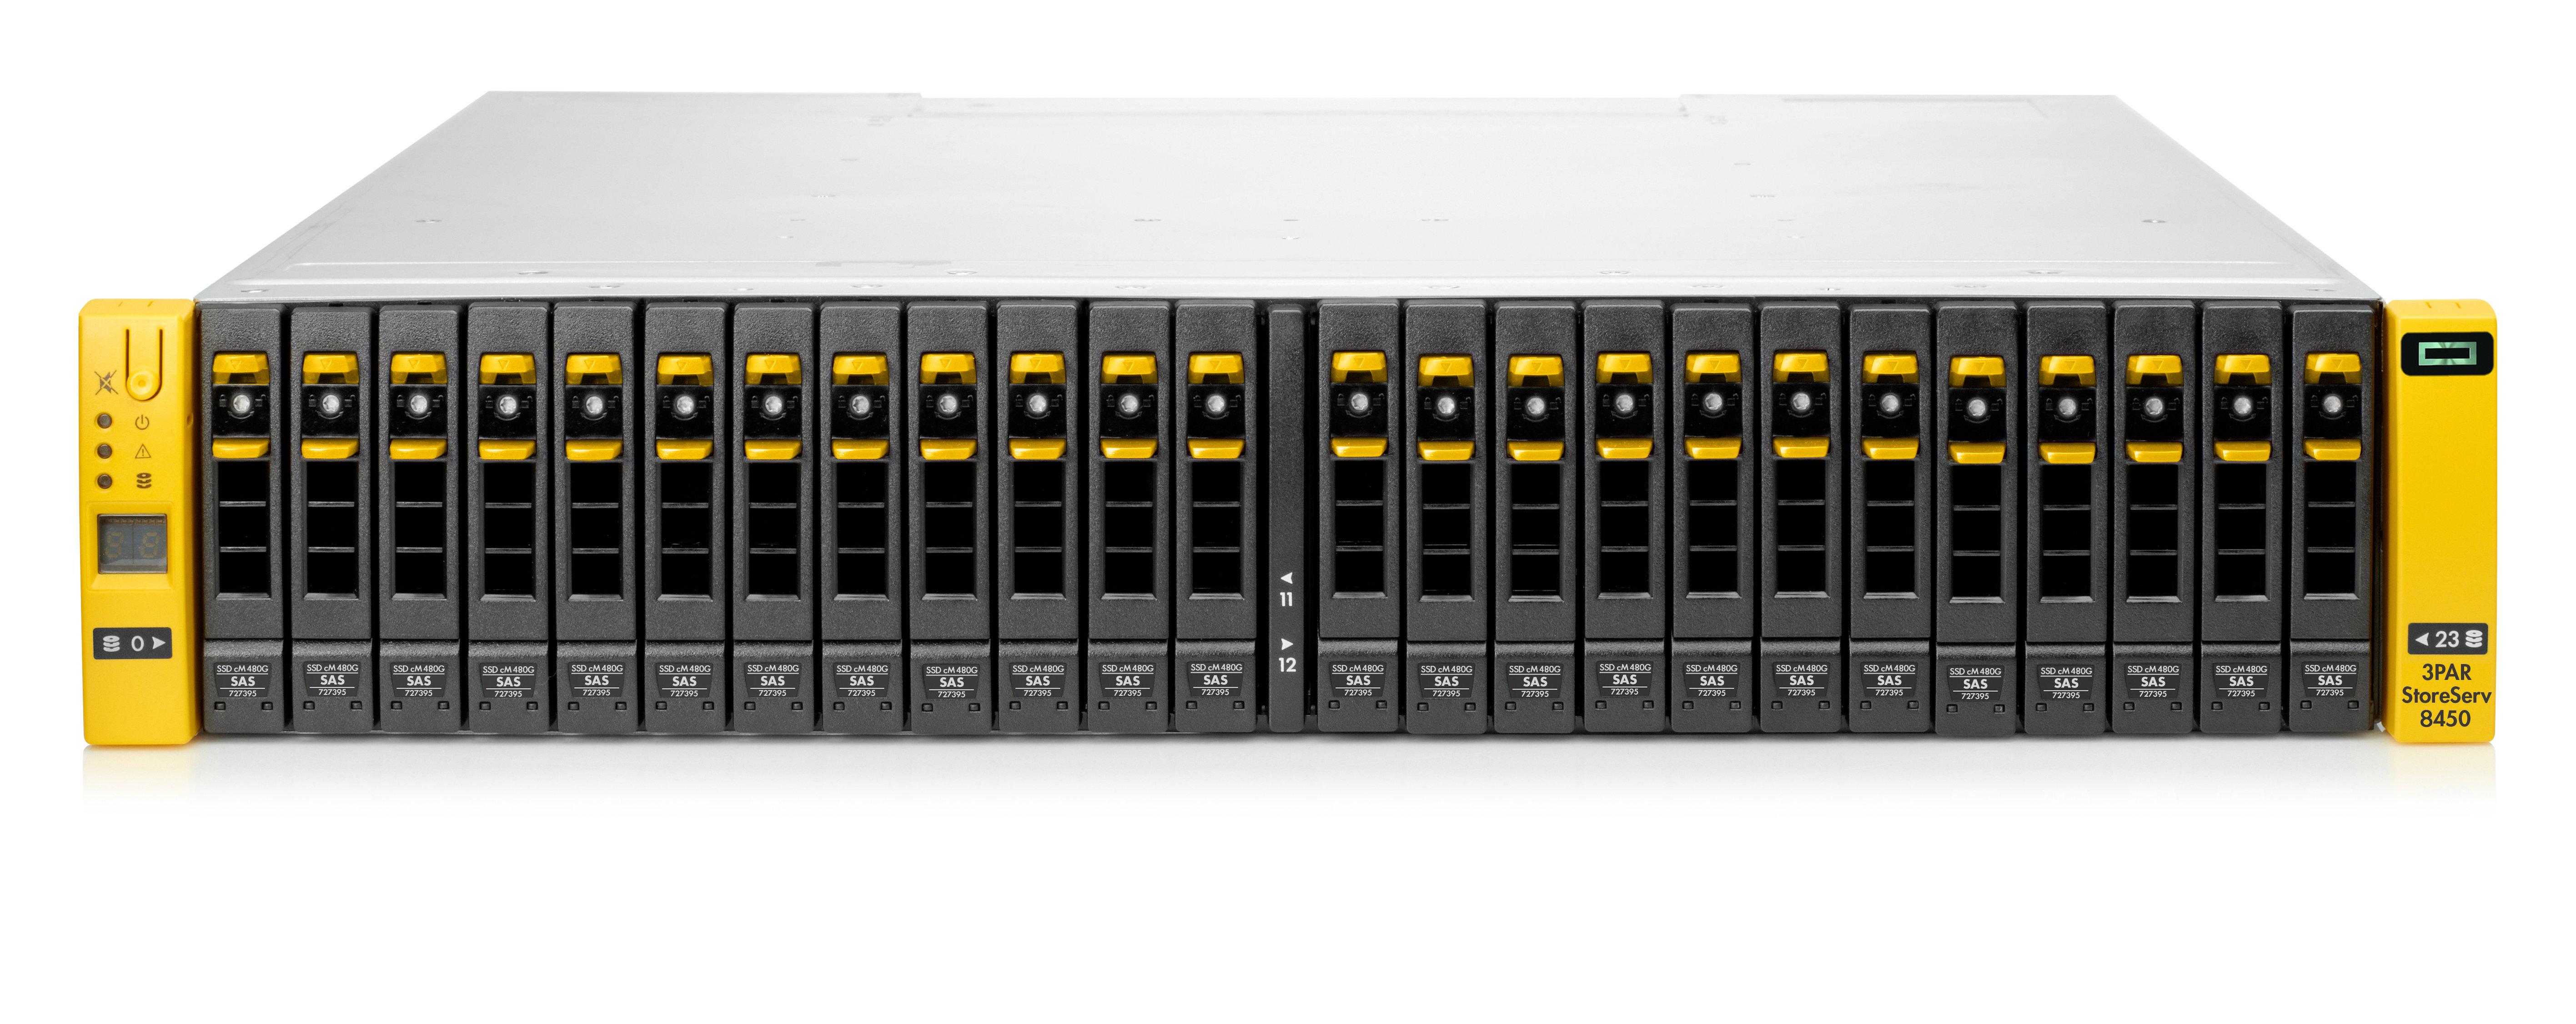 NJB Sales - Hewlett Packard Enterprise - HPE 3PAR StoreServ 8400 2